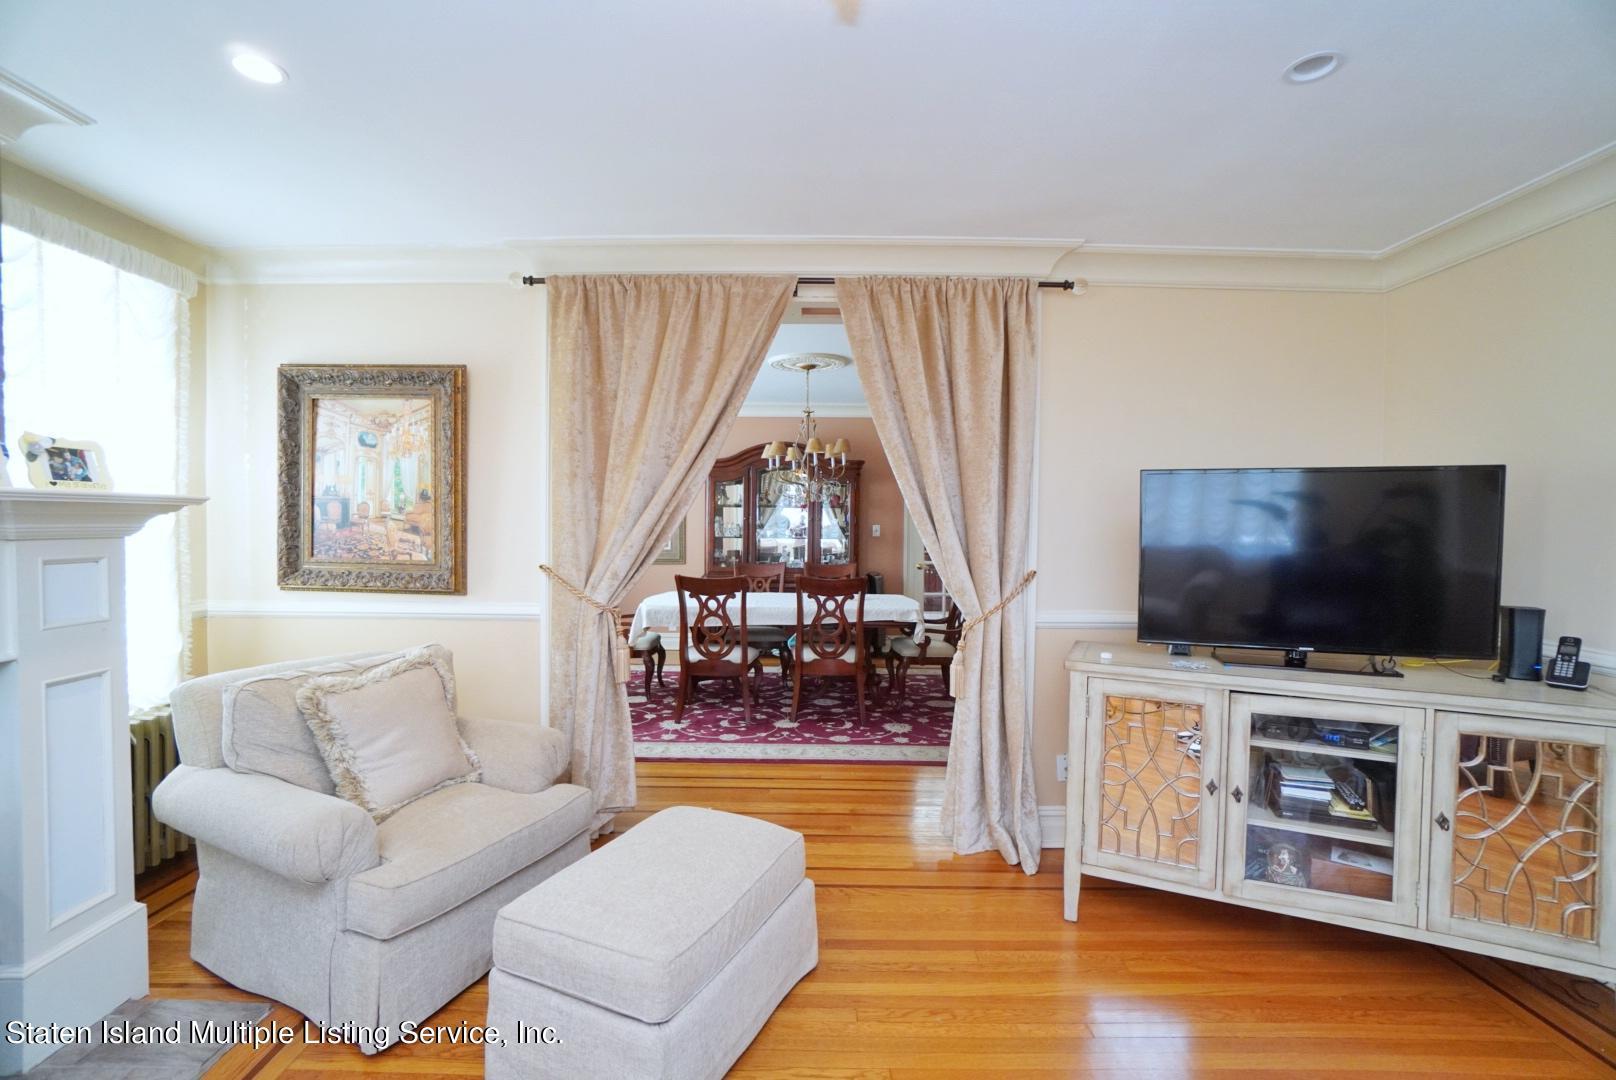 Single Family - Detached 264 Fisher Avenue  Staten Island, NY 10307, MLS-1146898-11